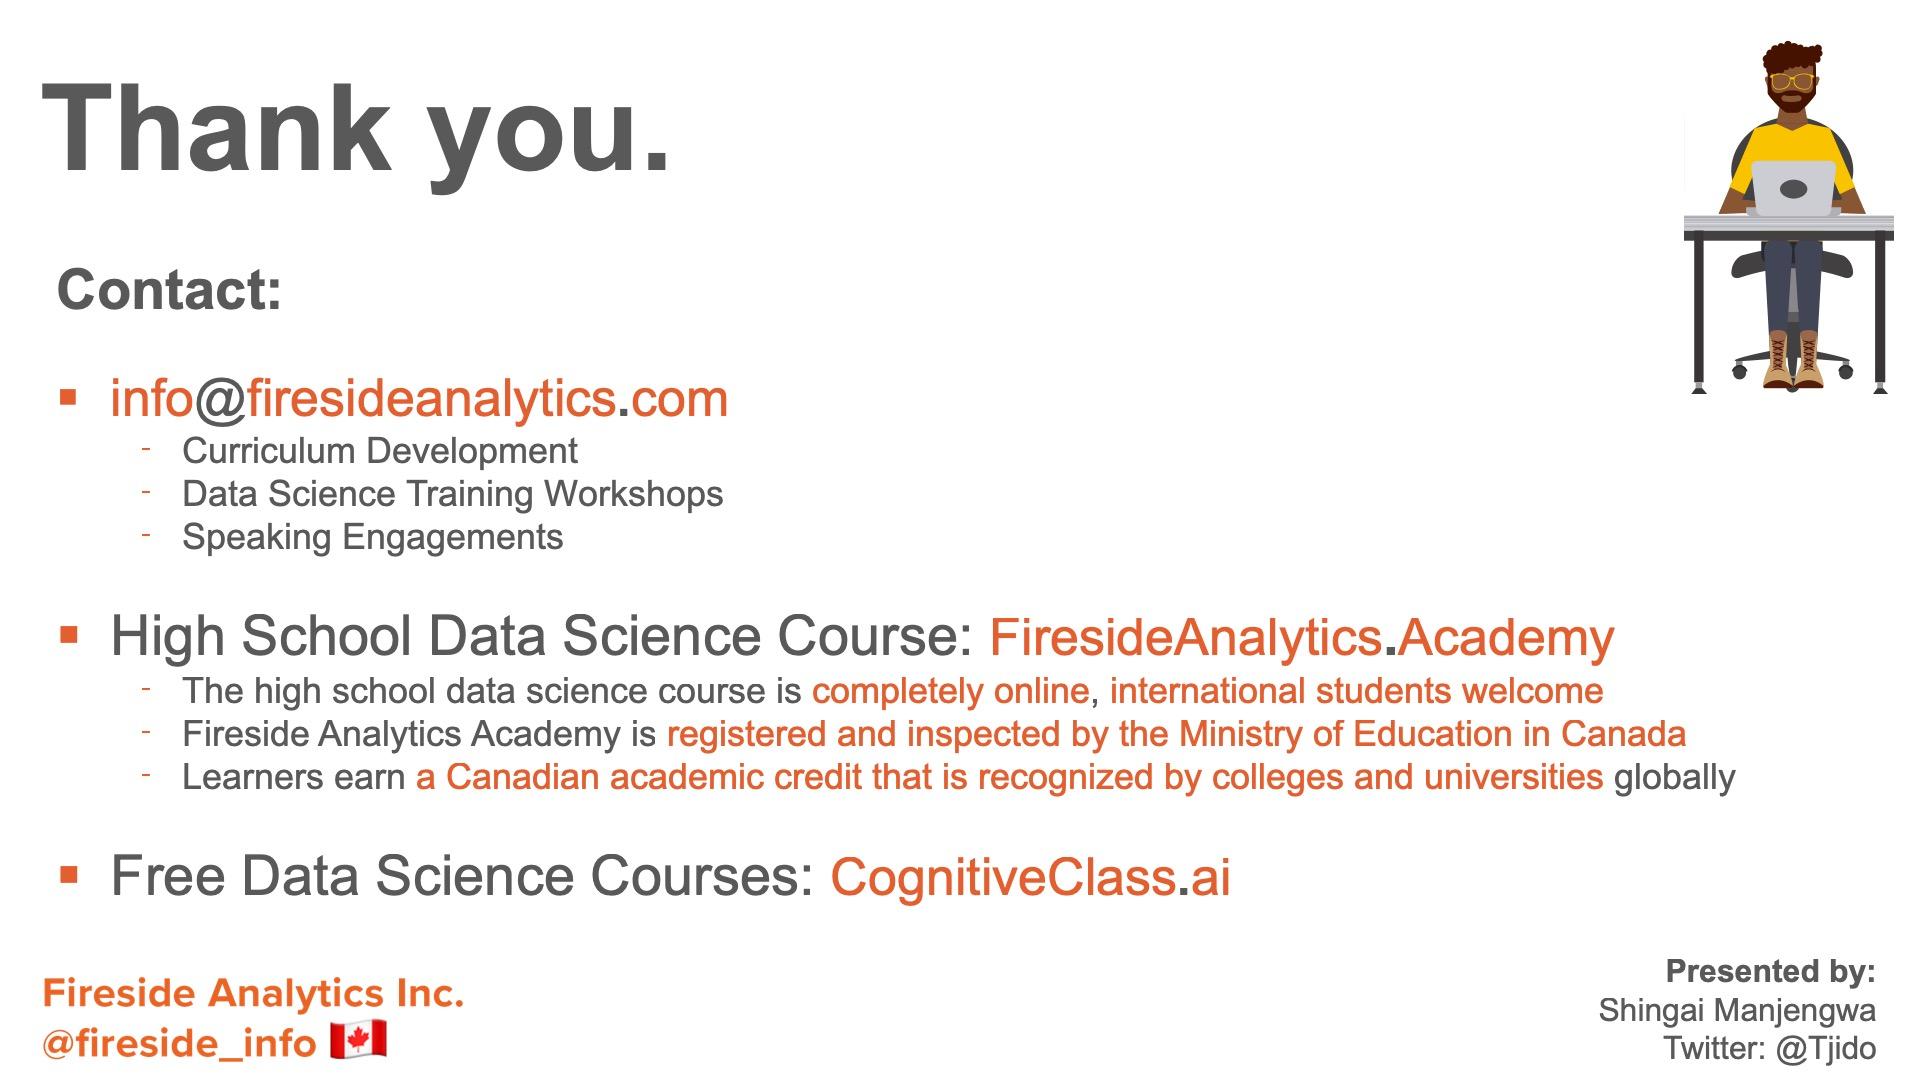 DAB Conference_Fireside Analytics Inc_46.jpeg